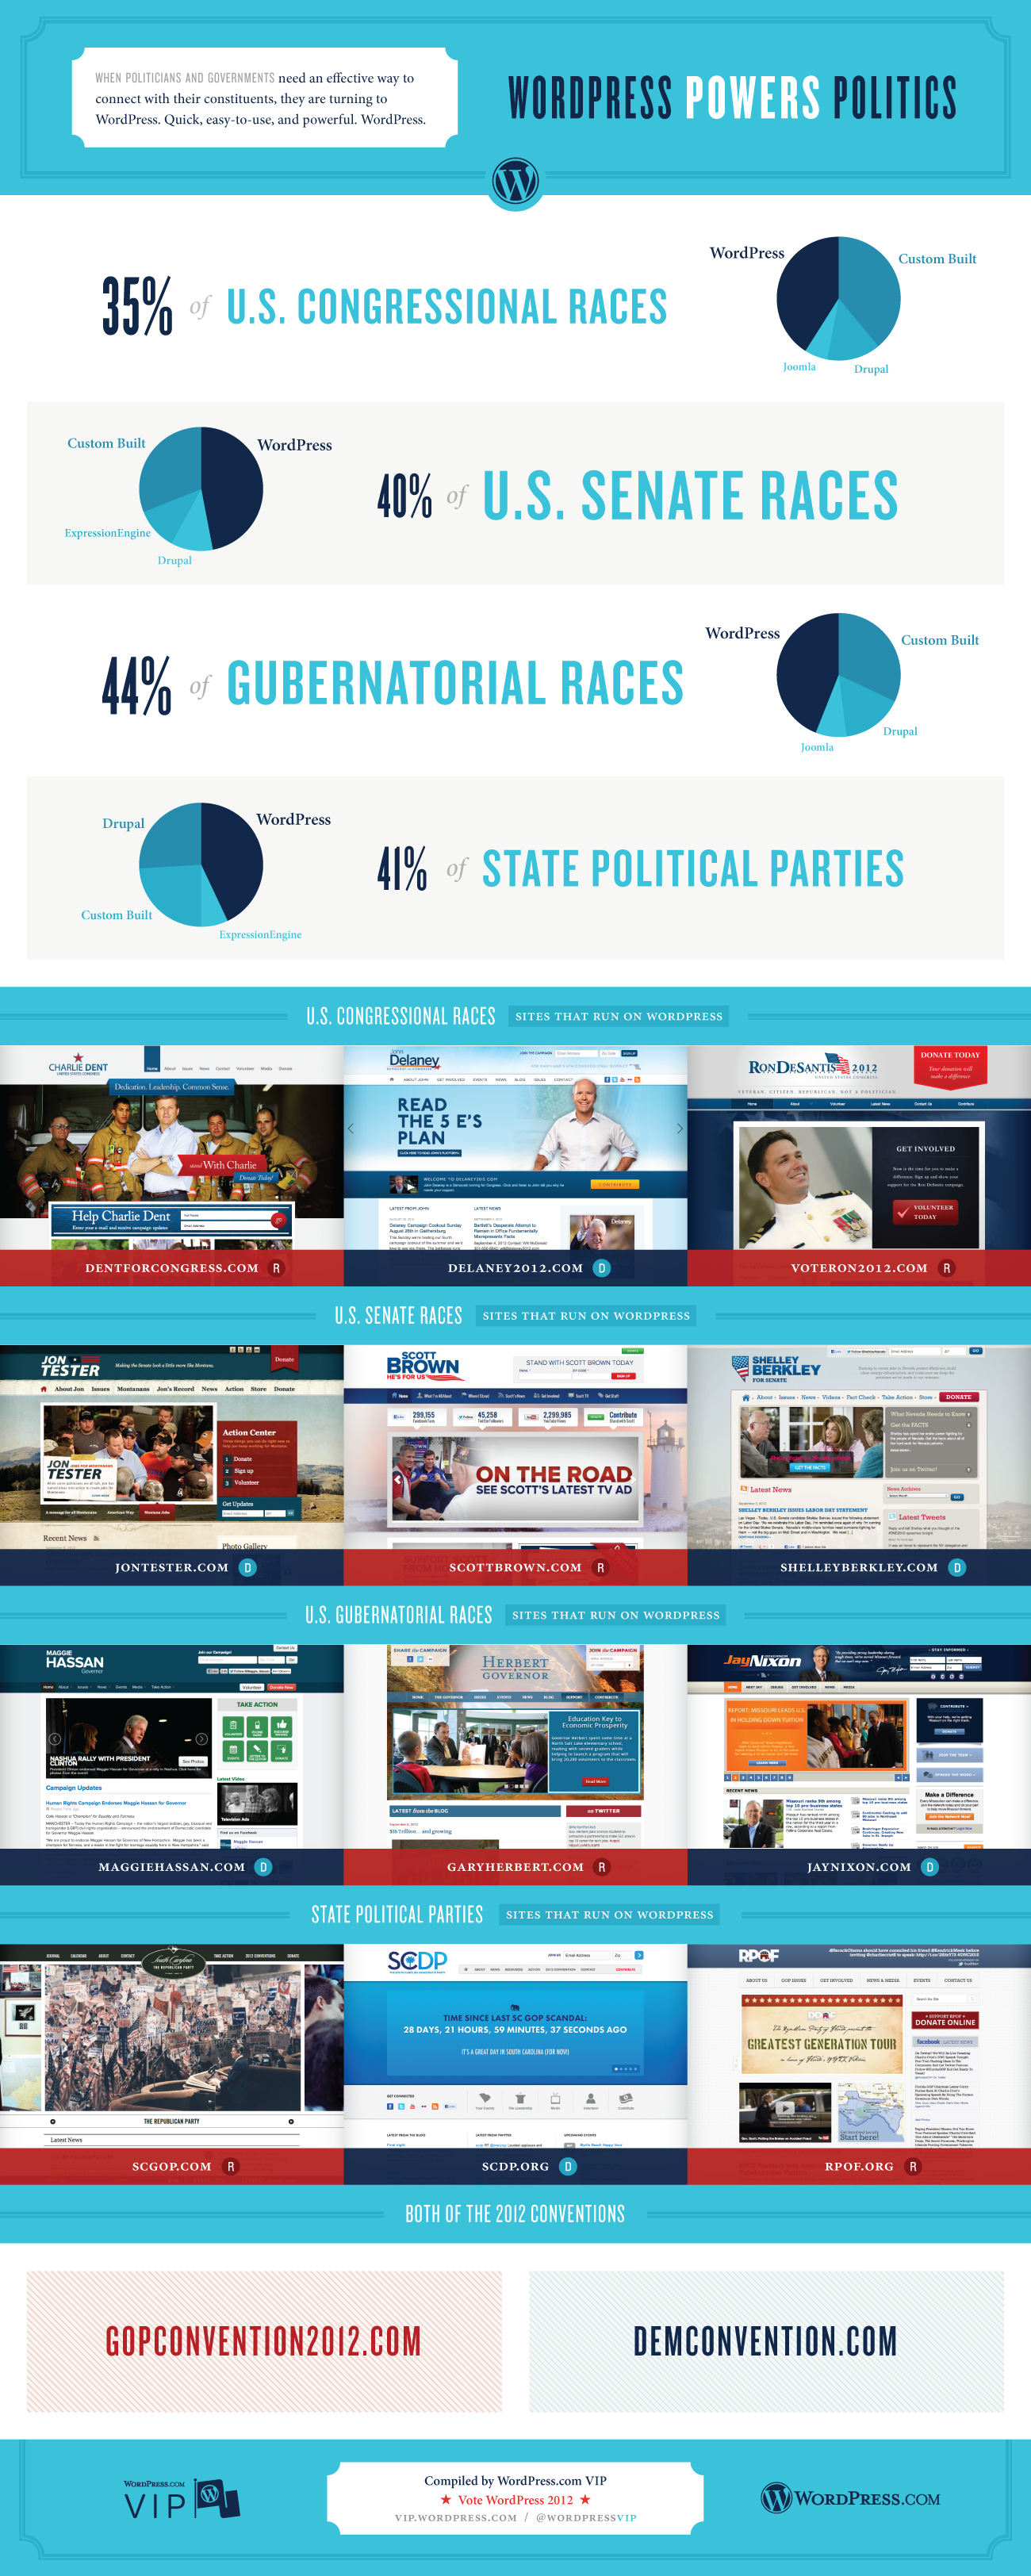 WordPress Powers Politics – WordPress.com VIP: Enterprise ...